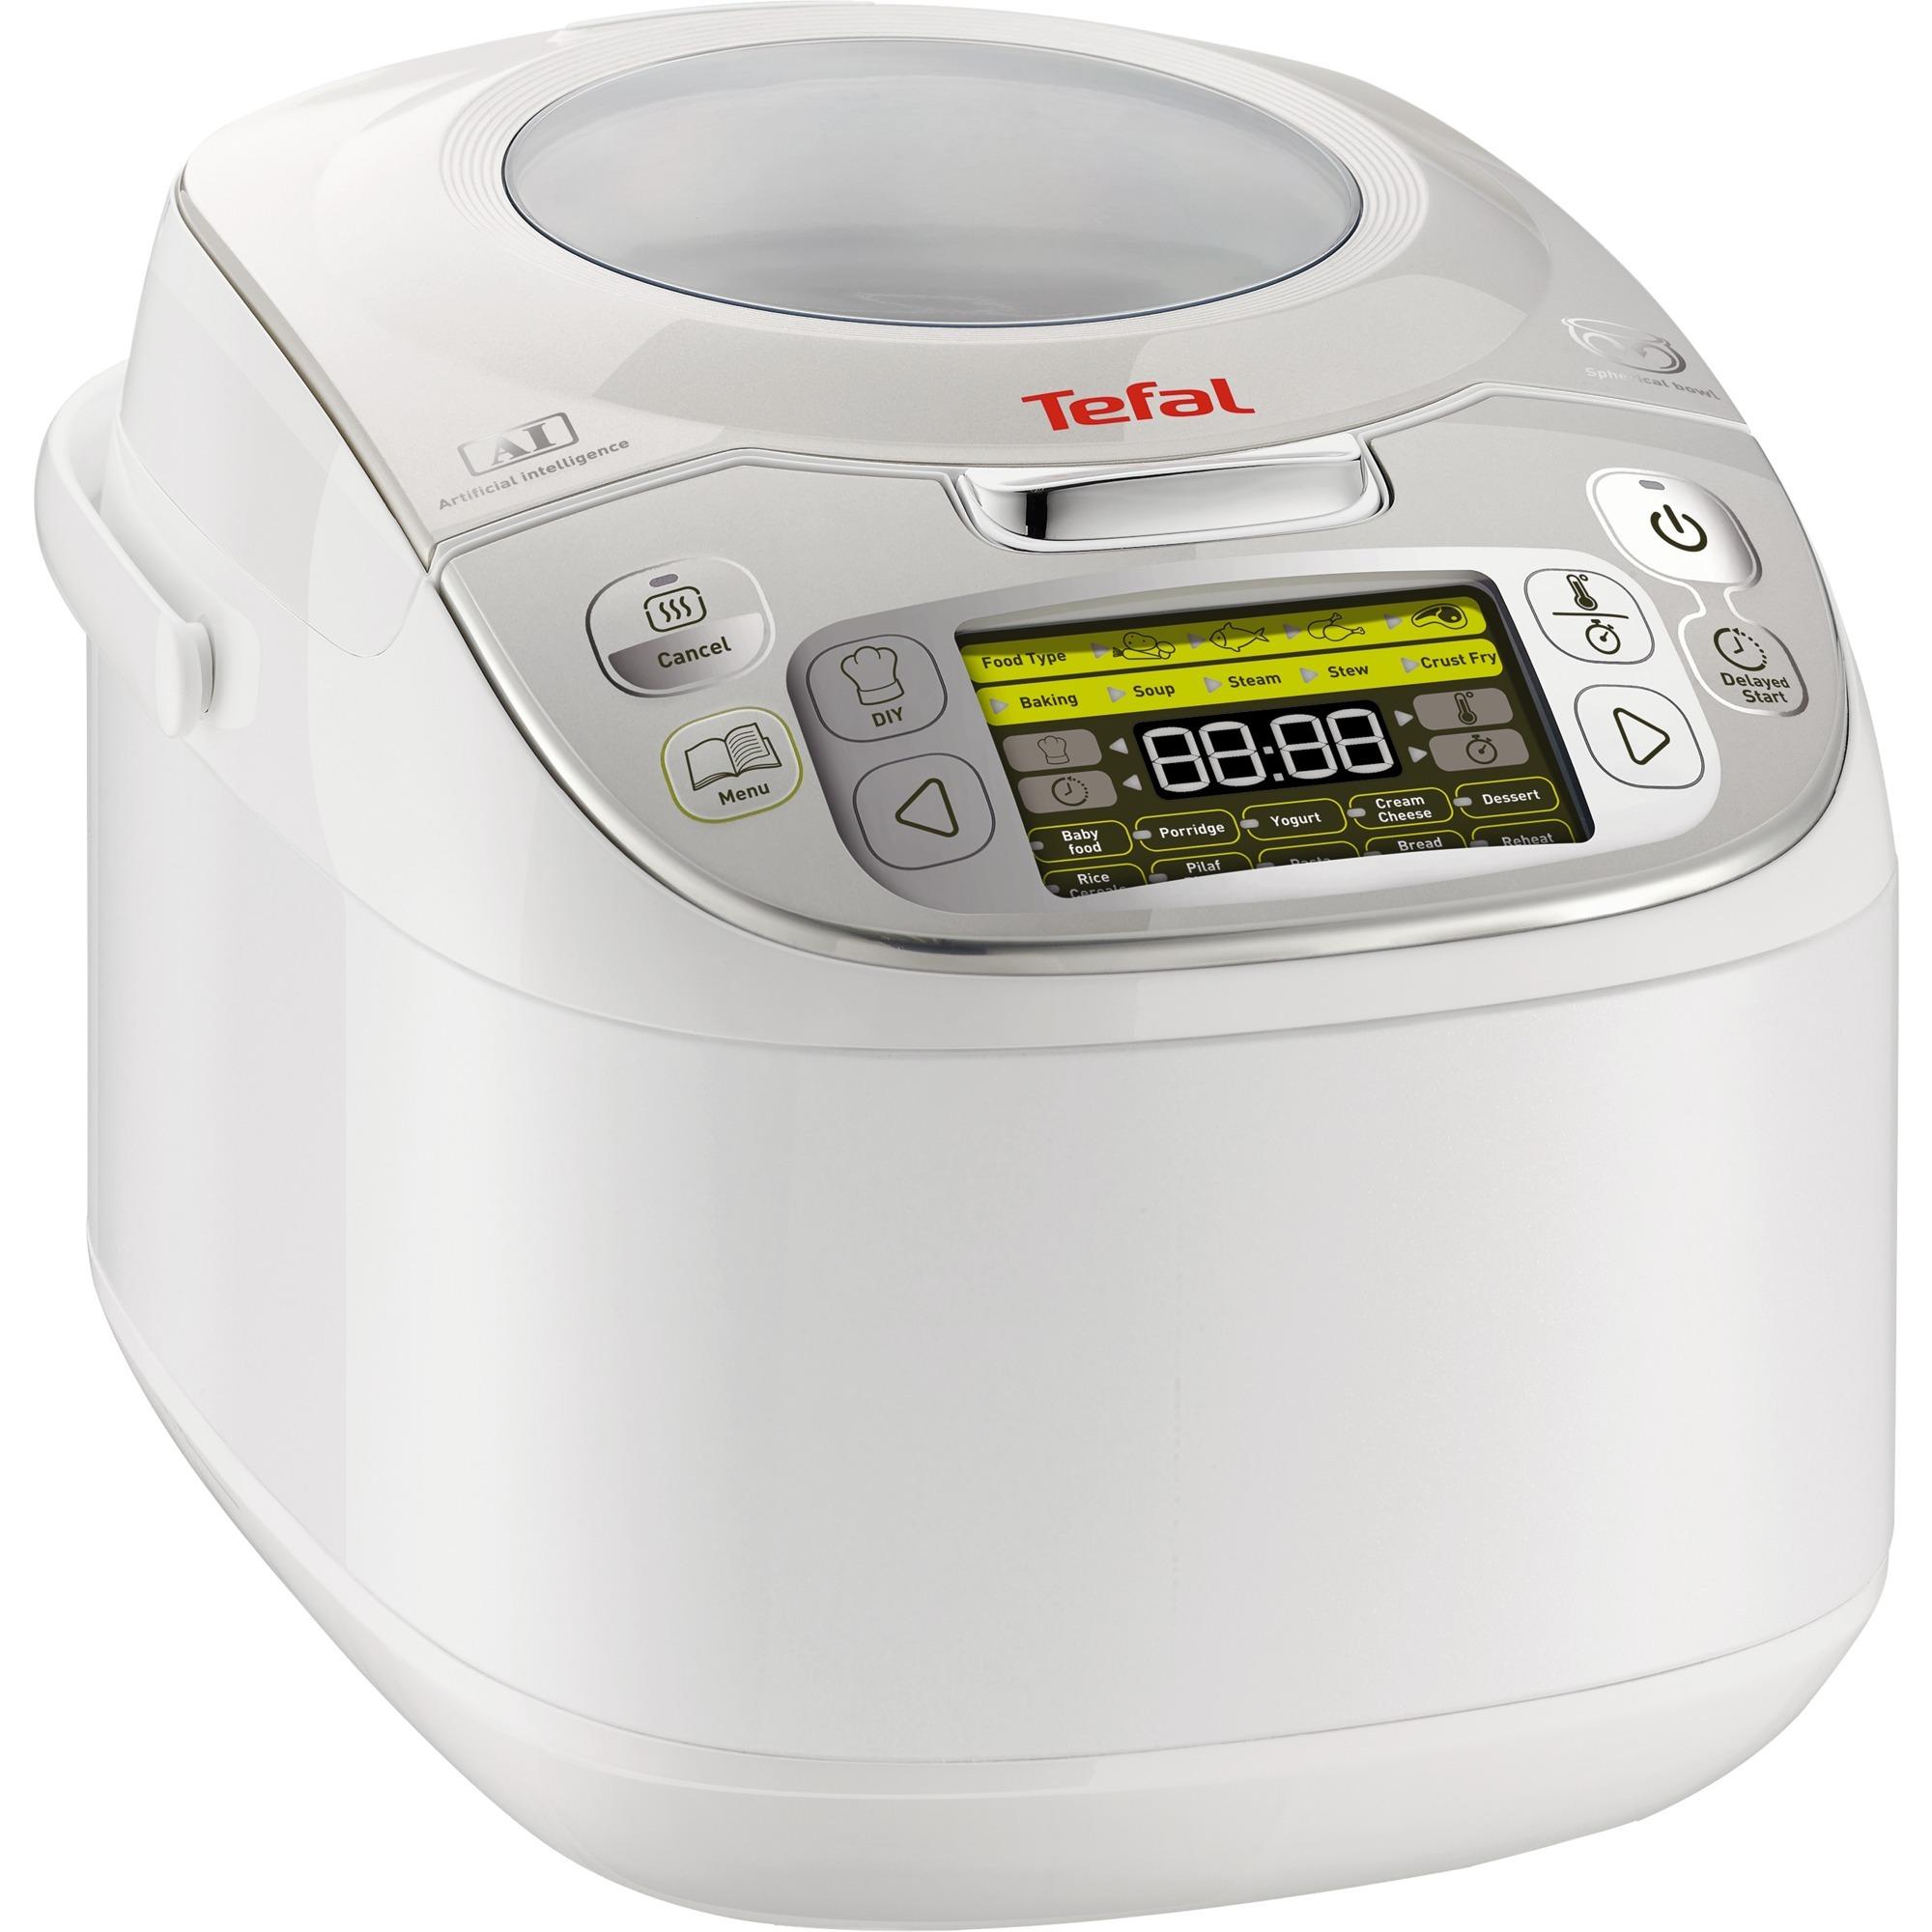 RK8121 1.8L 750W Plata, Color blanco olla multi-cocción, Cocina multi